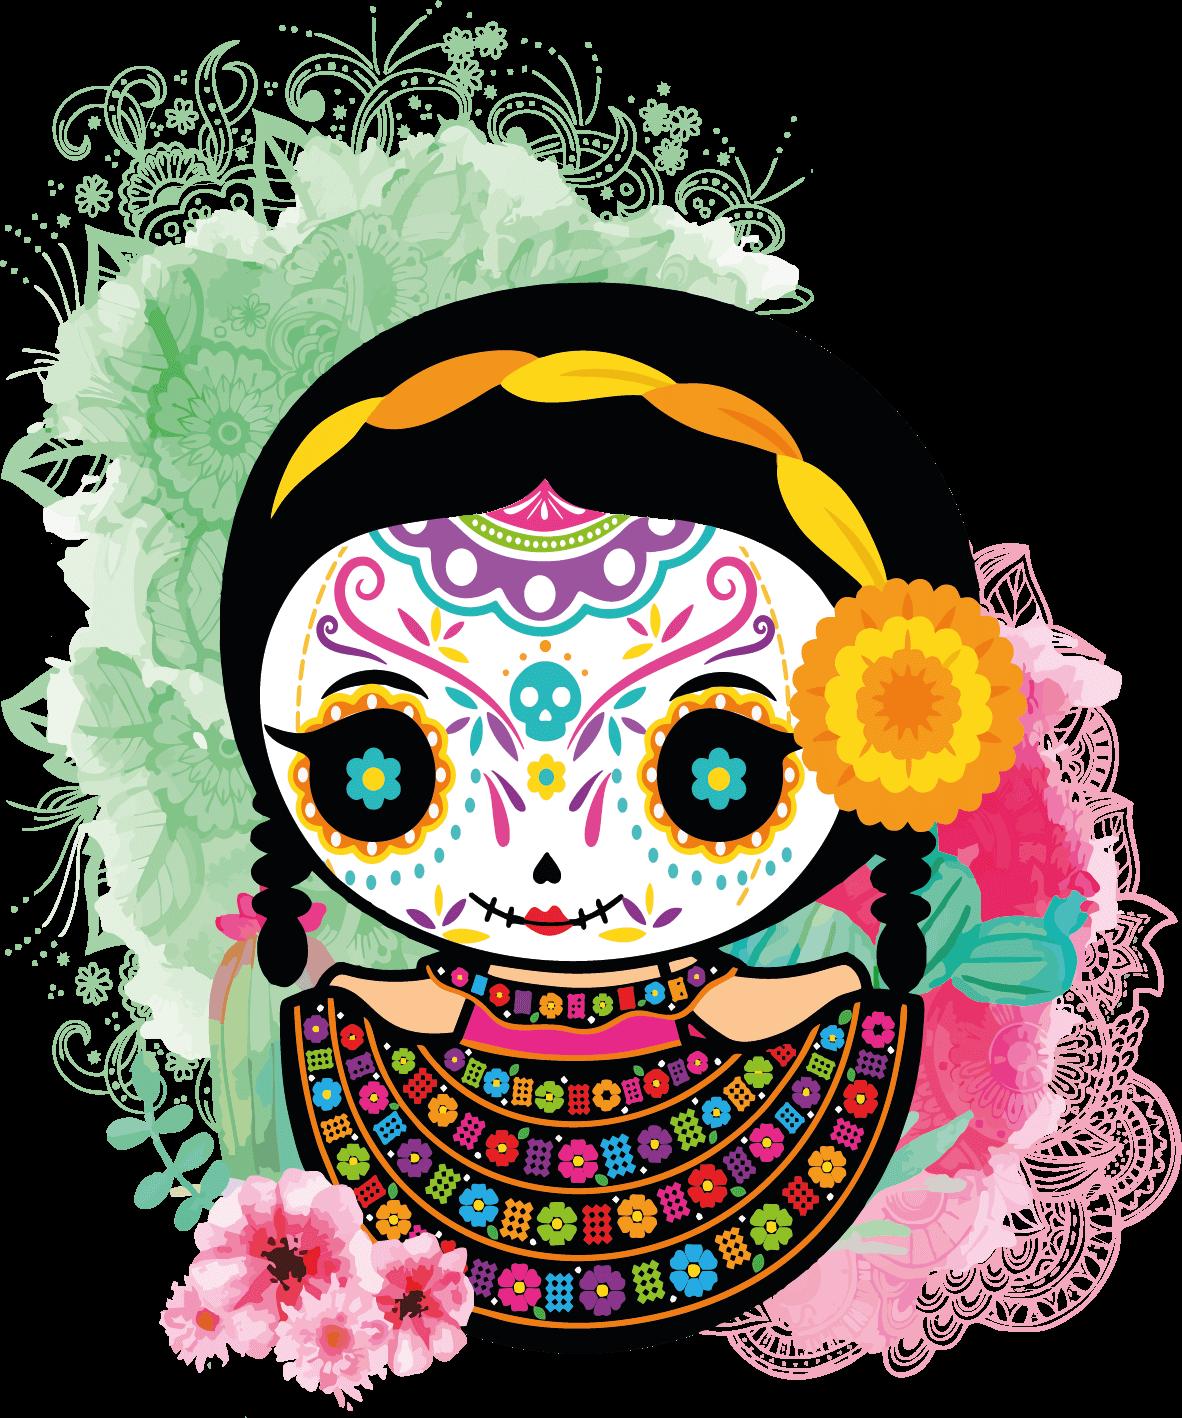 Munequitas Sugar Skull Dia De Muertos Halloween V2 Vector Dia De Muertos Fondos De Halloween Dia De Muertos Png